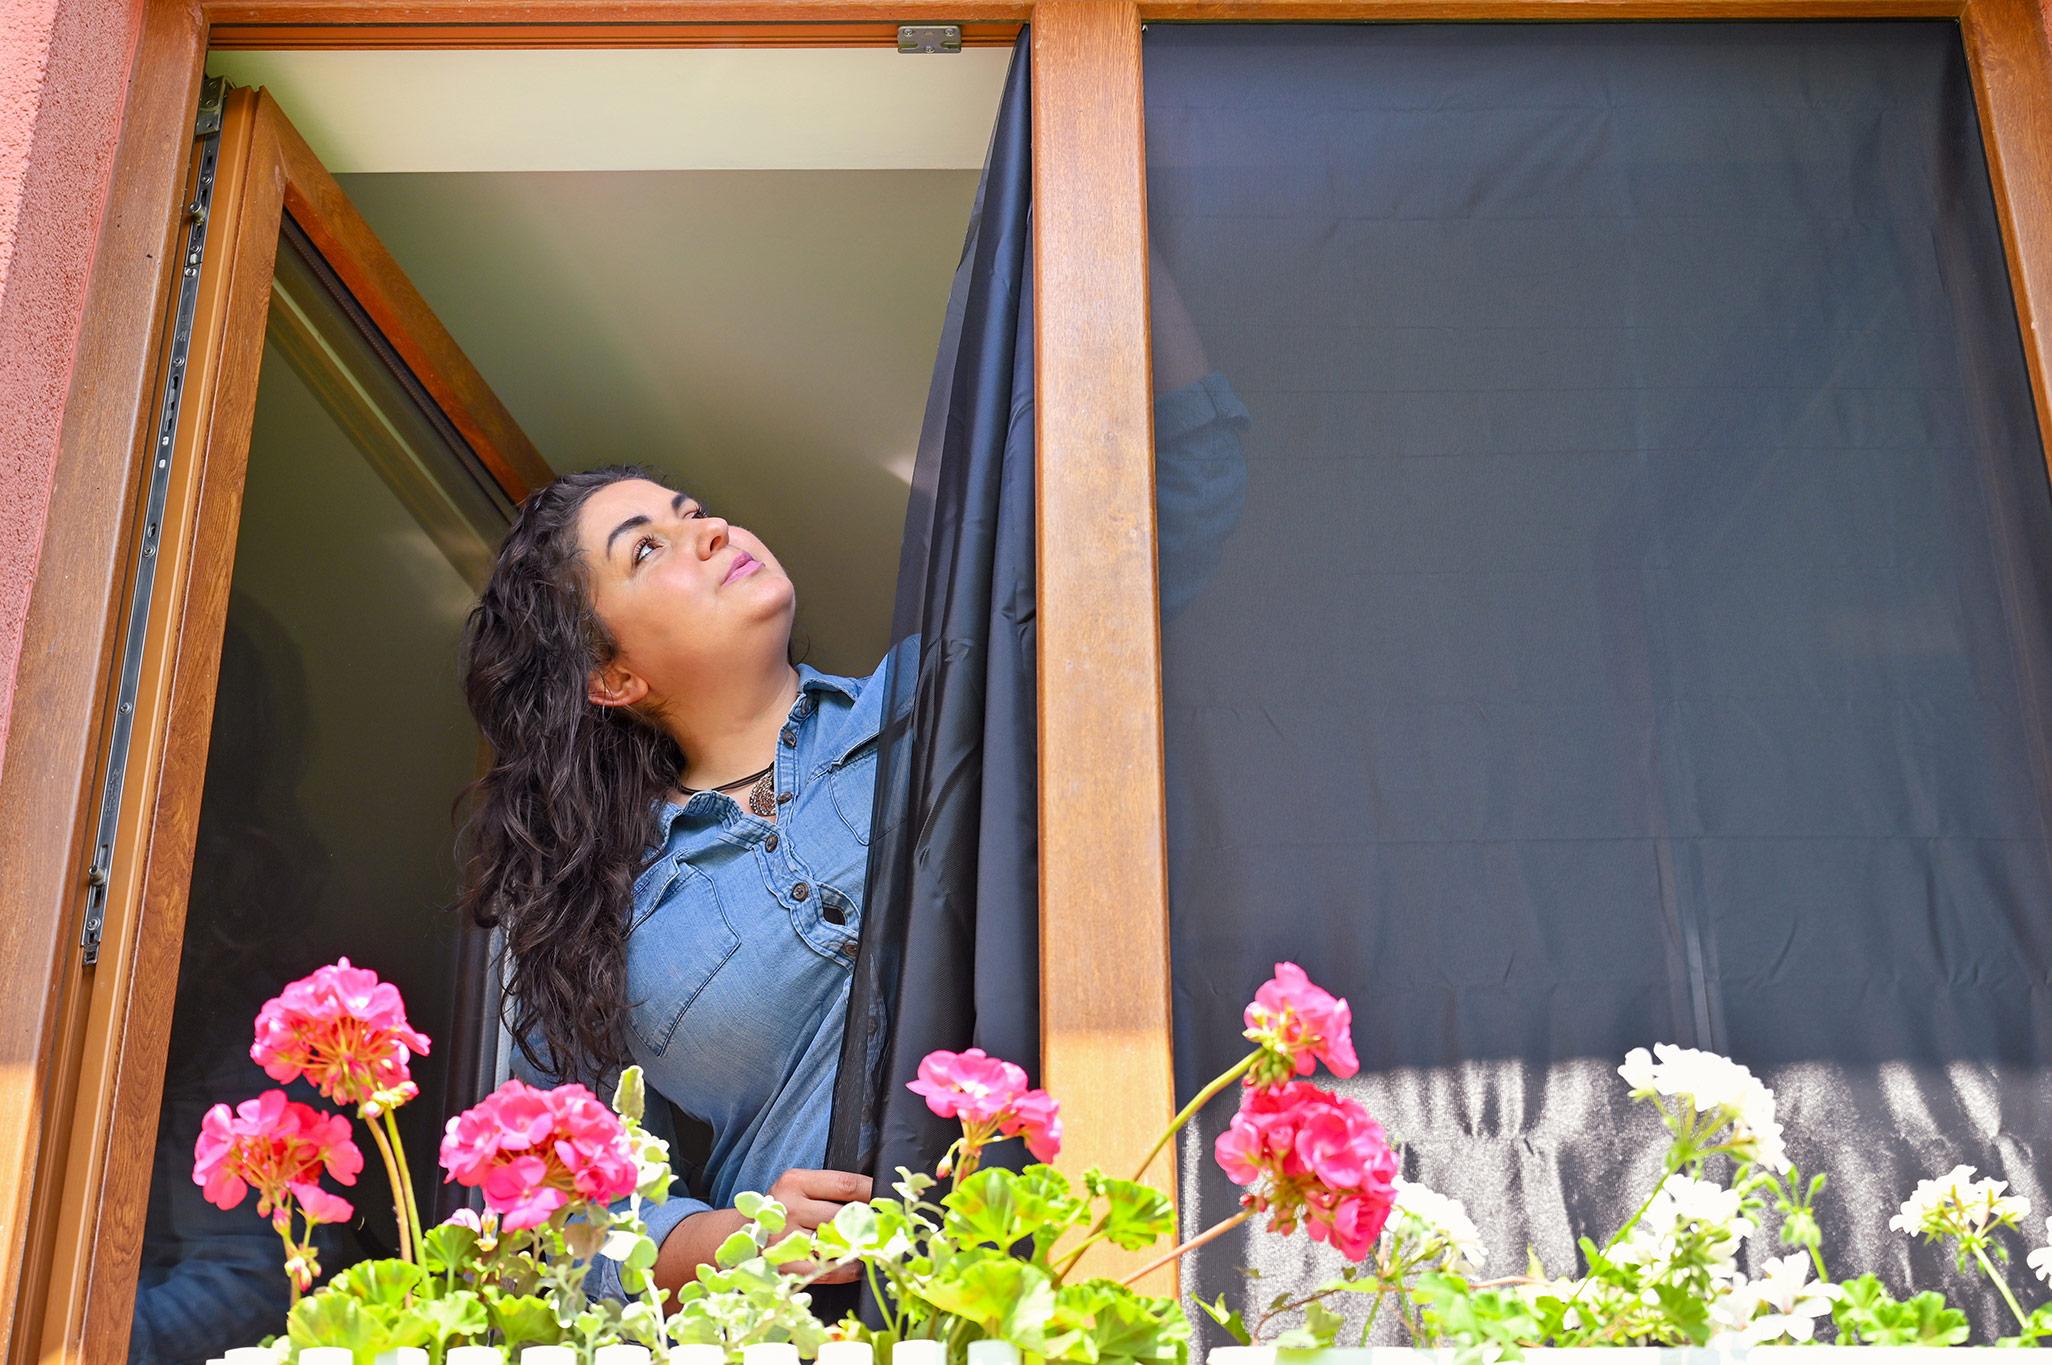 Moskitiera na okno, moskitiera z metra, moskitiera antyalergiczna, moskitiera samoprzylepna, montaż moskitiery